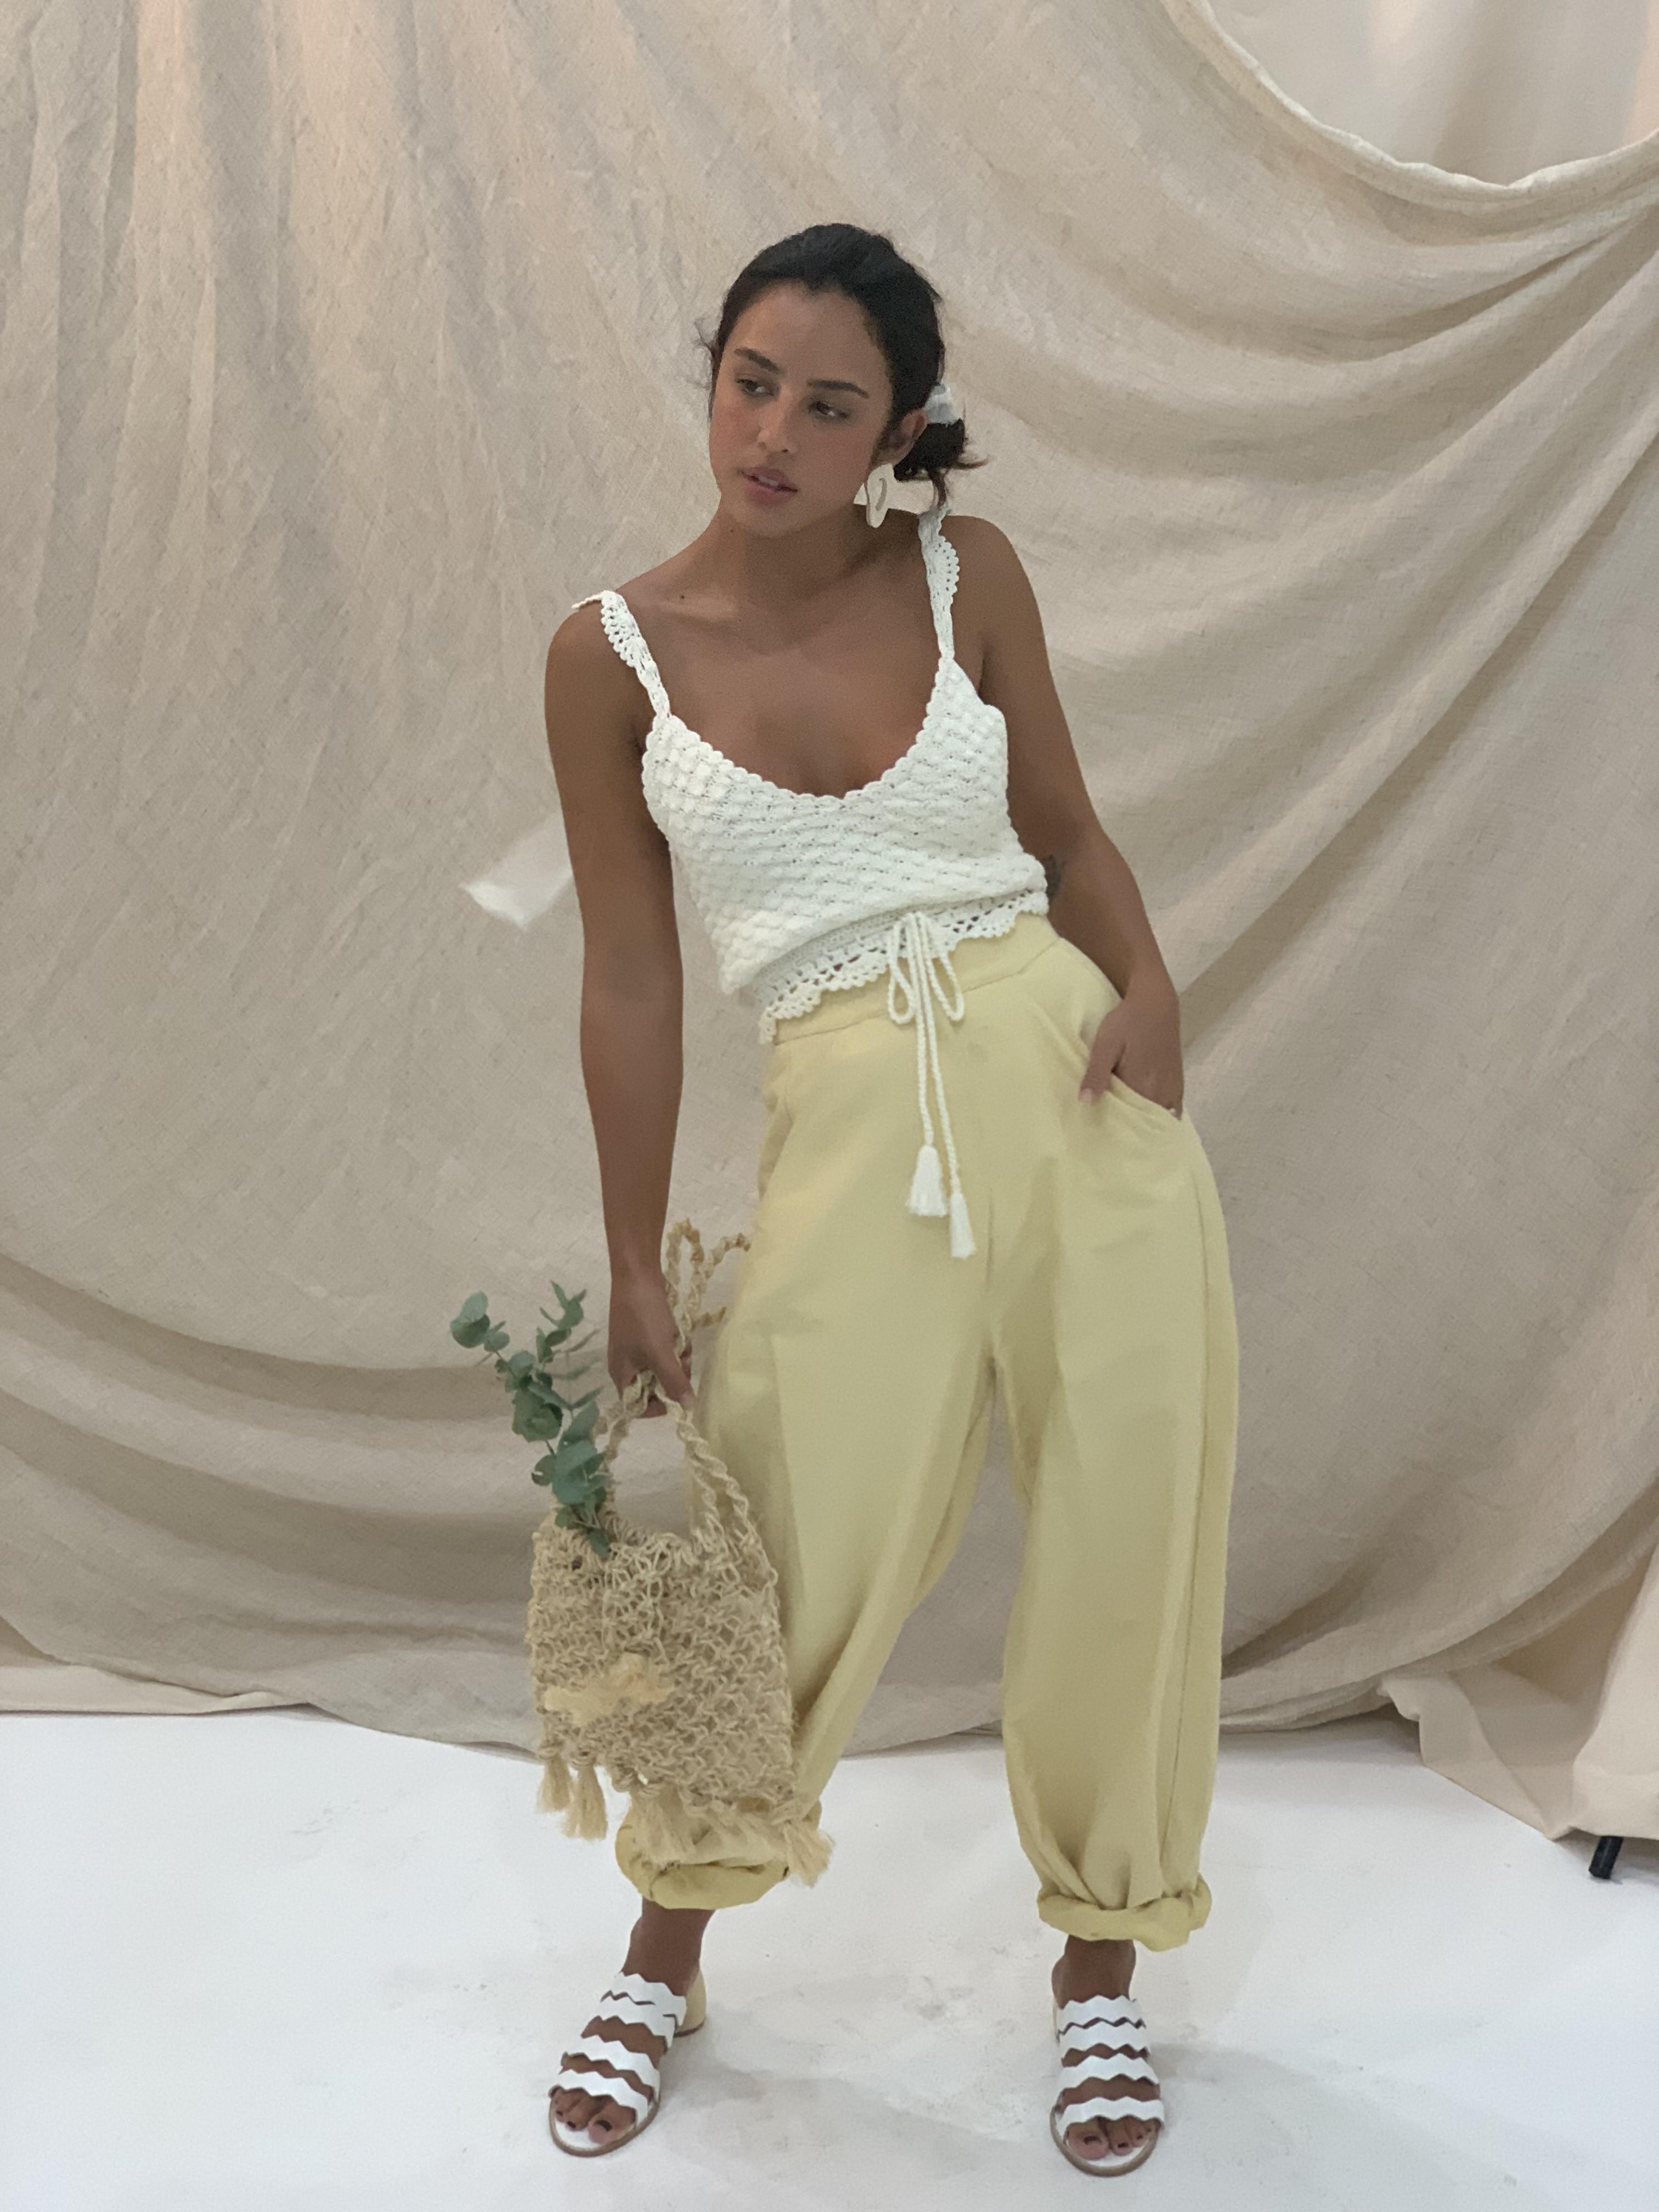 Yanna Lavigne em ensaio de moda para Glamour (Foto: Renata Telles)